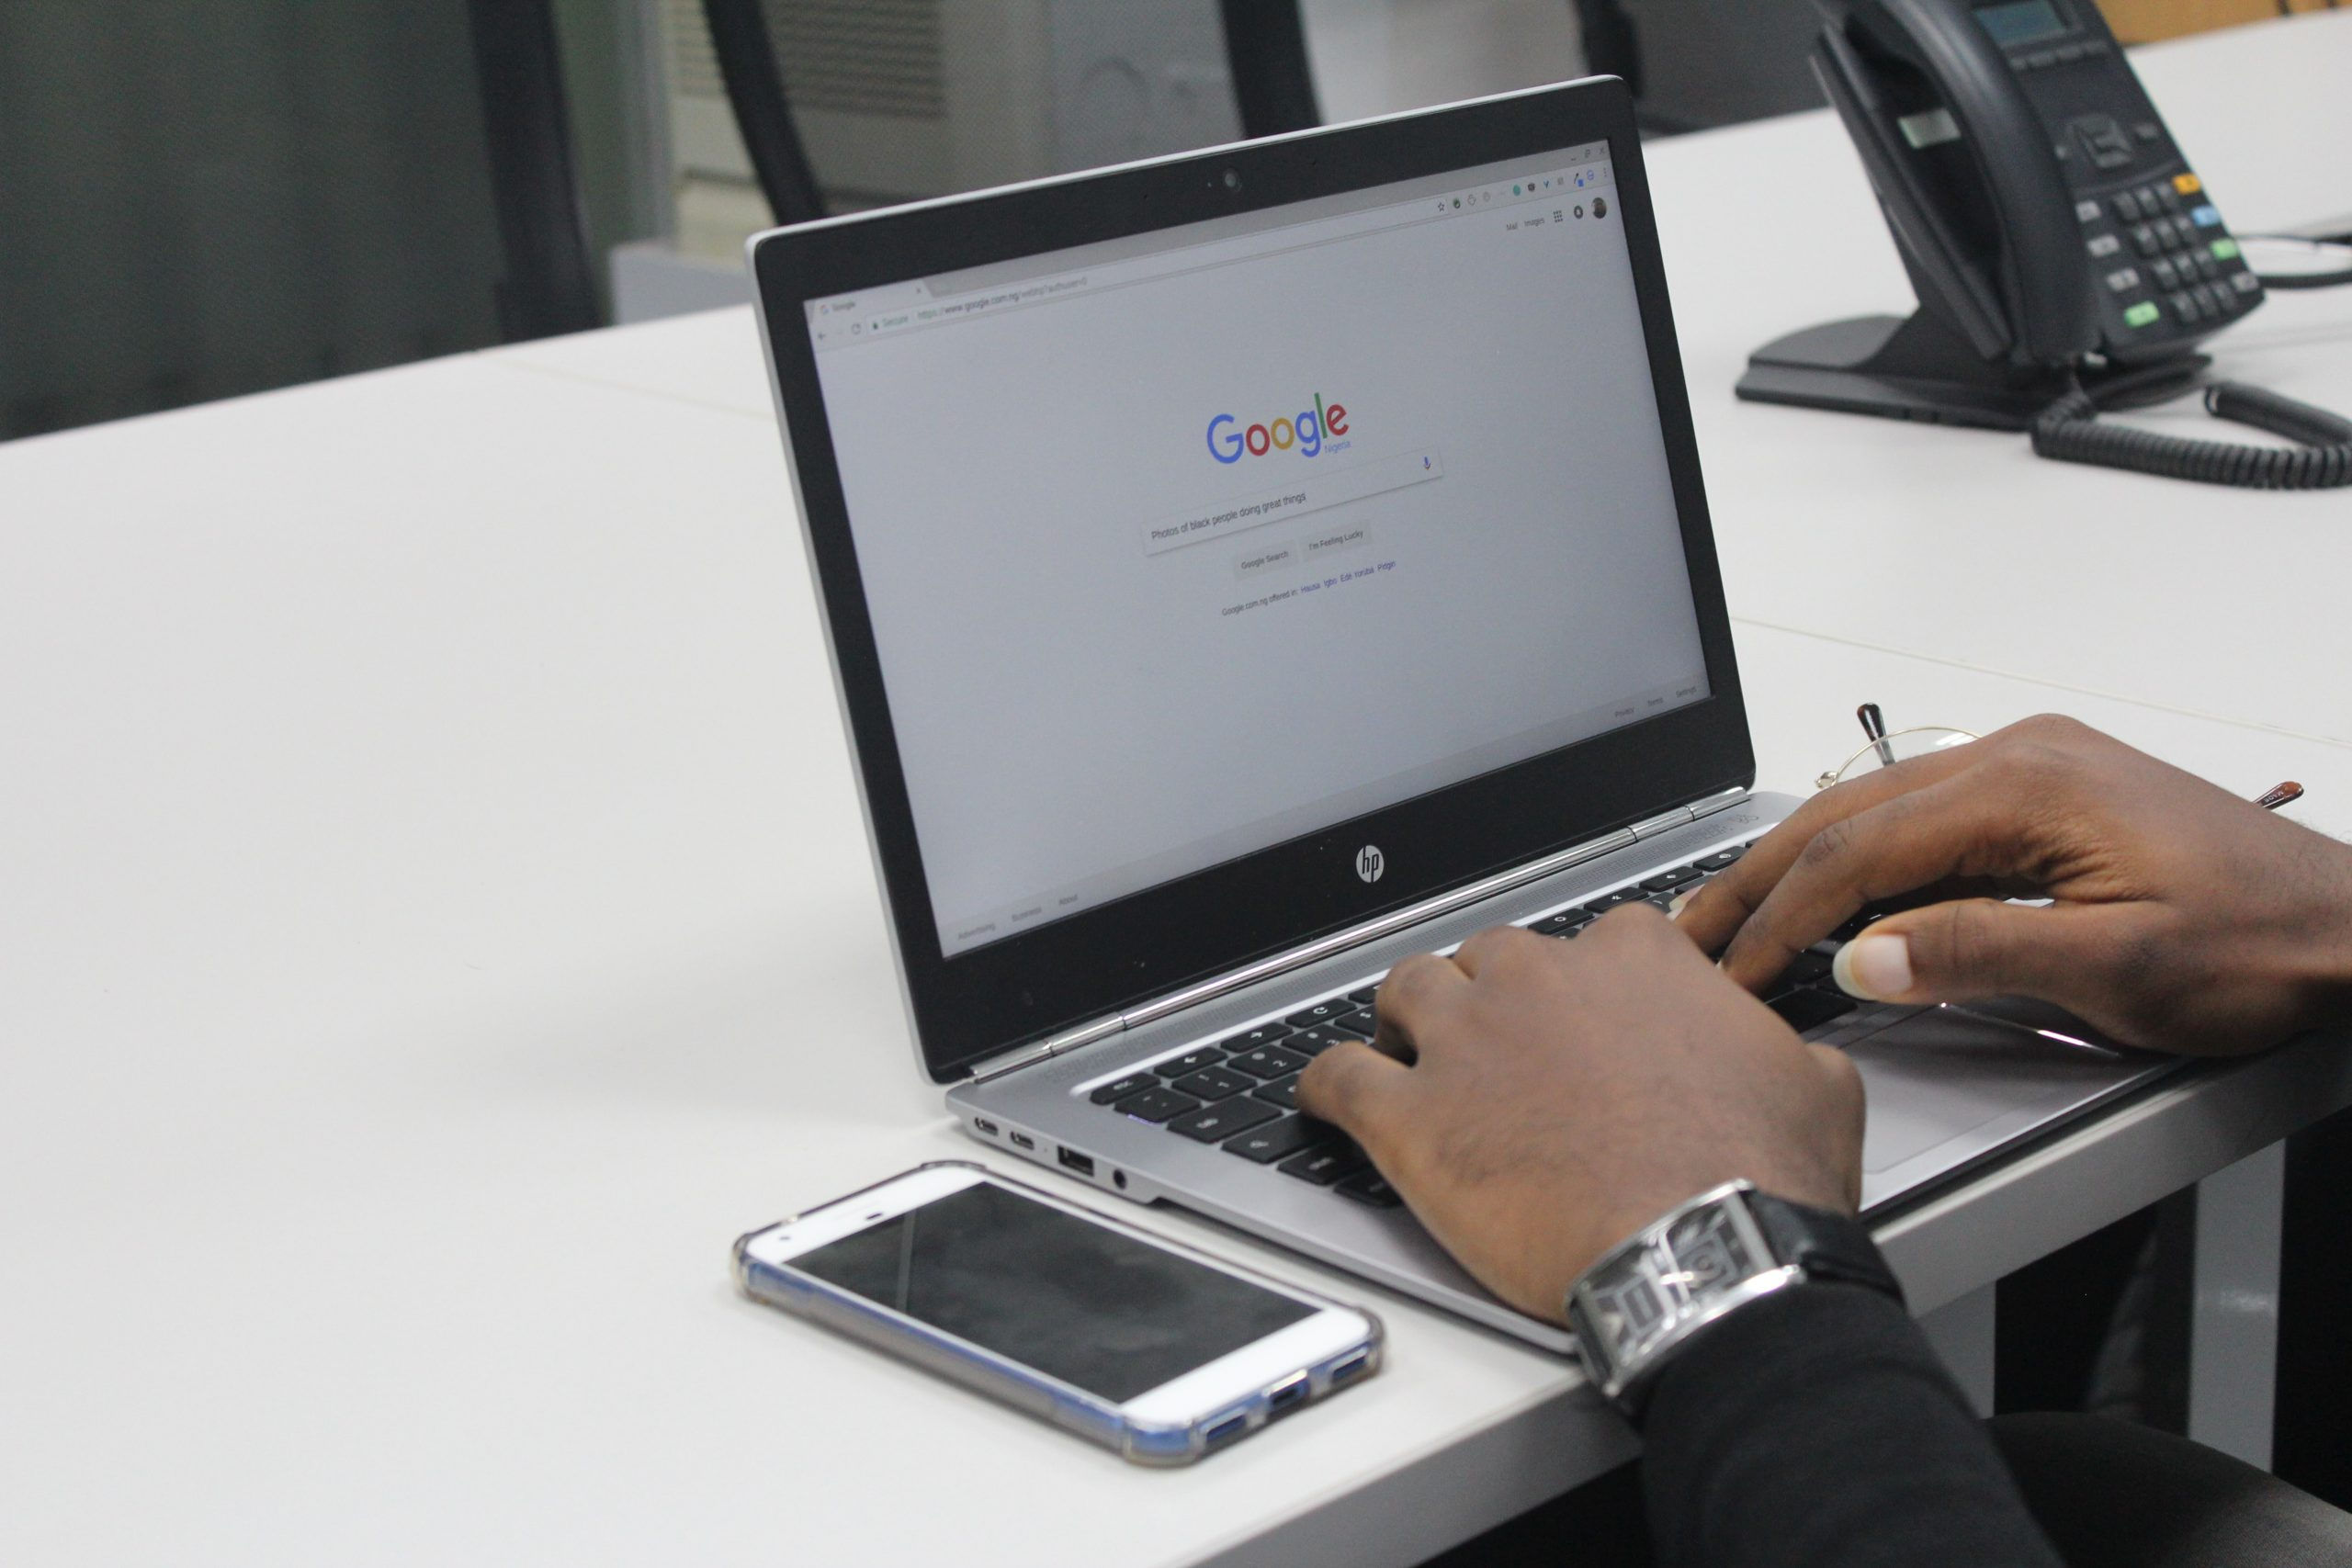 Google explica como os portugueses utilizam os motores de busca